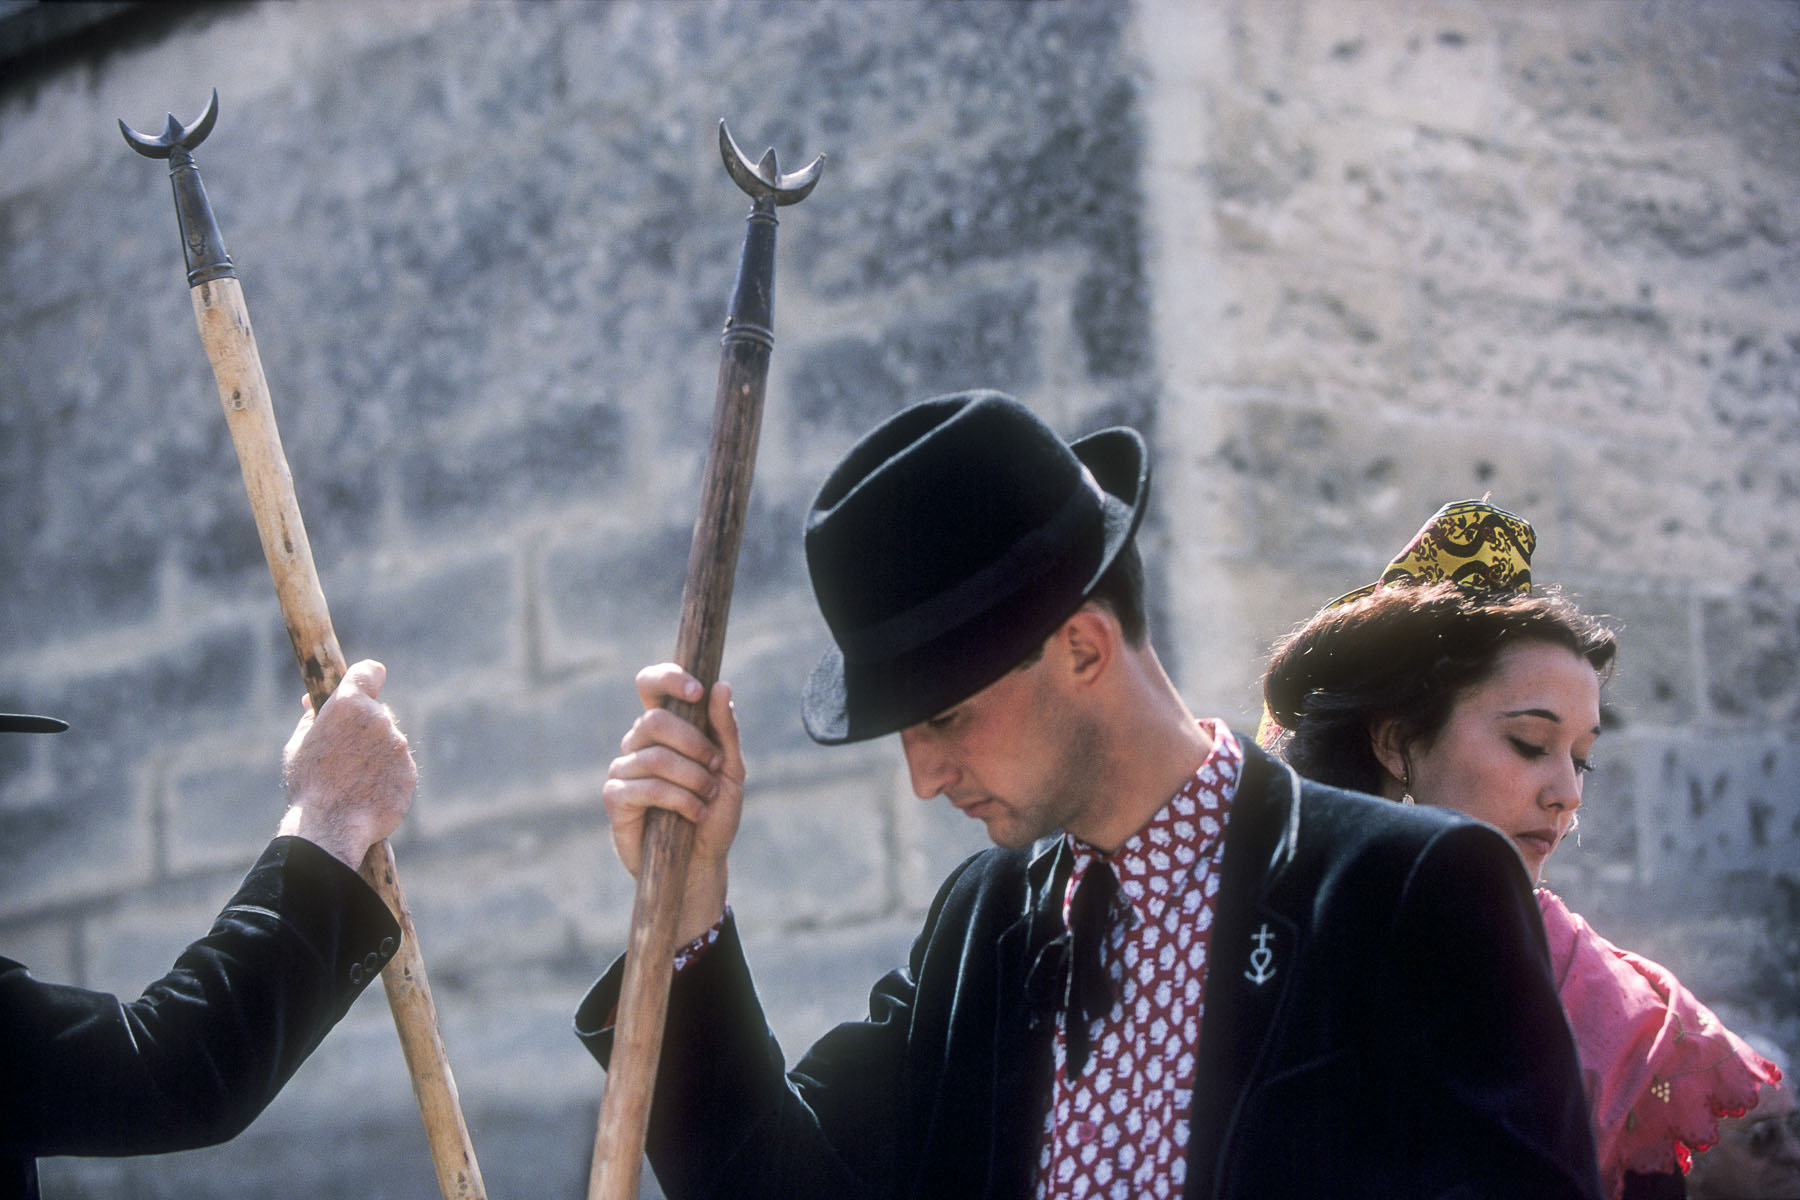 The Gardians' Festival. 2000